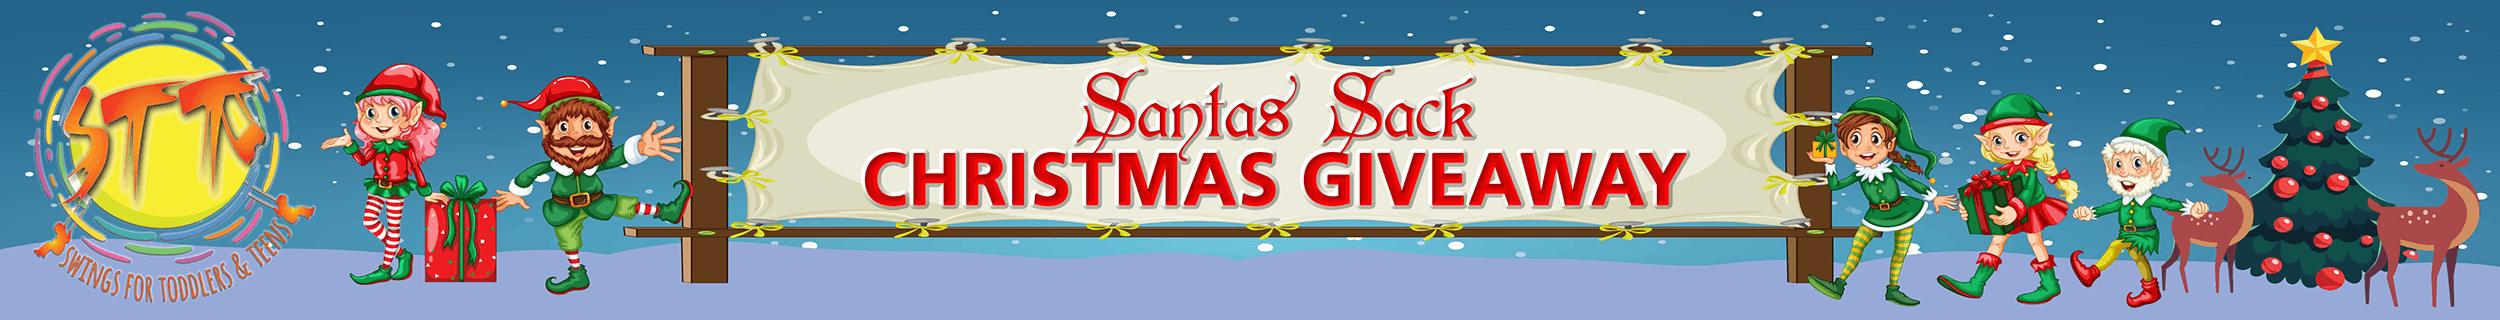 STT Santas Sack Christmas Giveaway